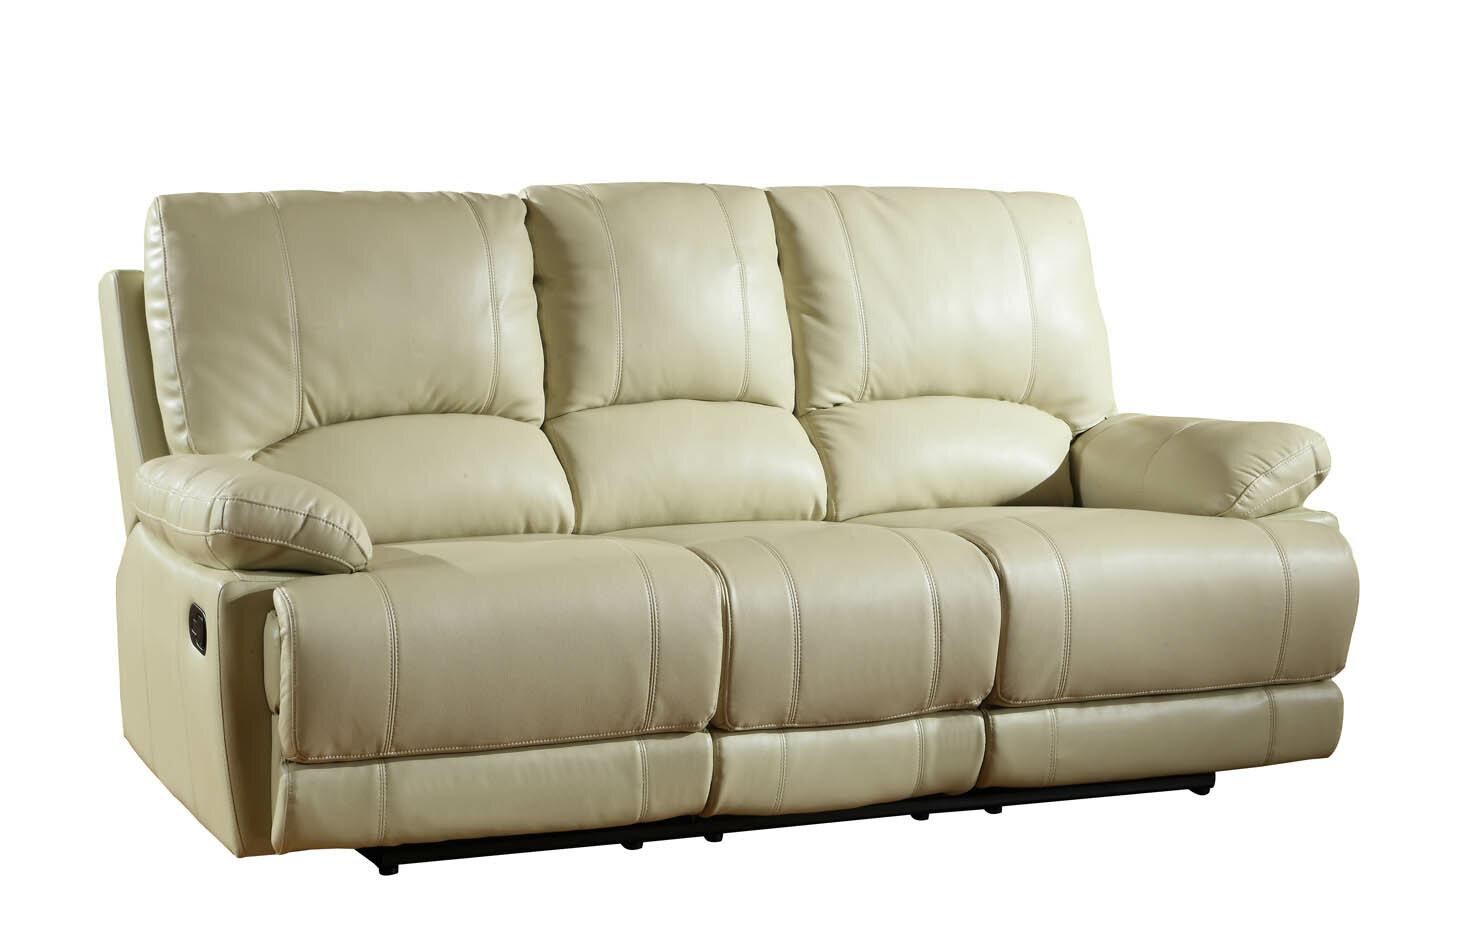 Winston Porter Ullery Upholstered Living Room Recliner Reclining ...